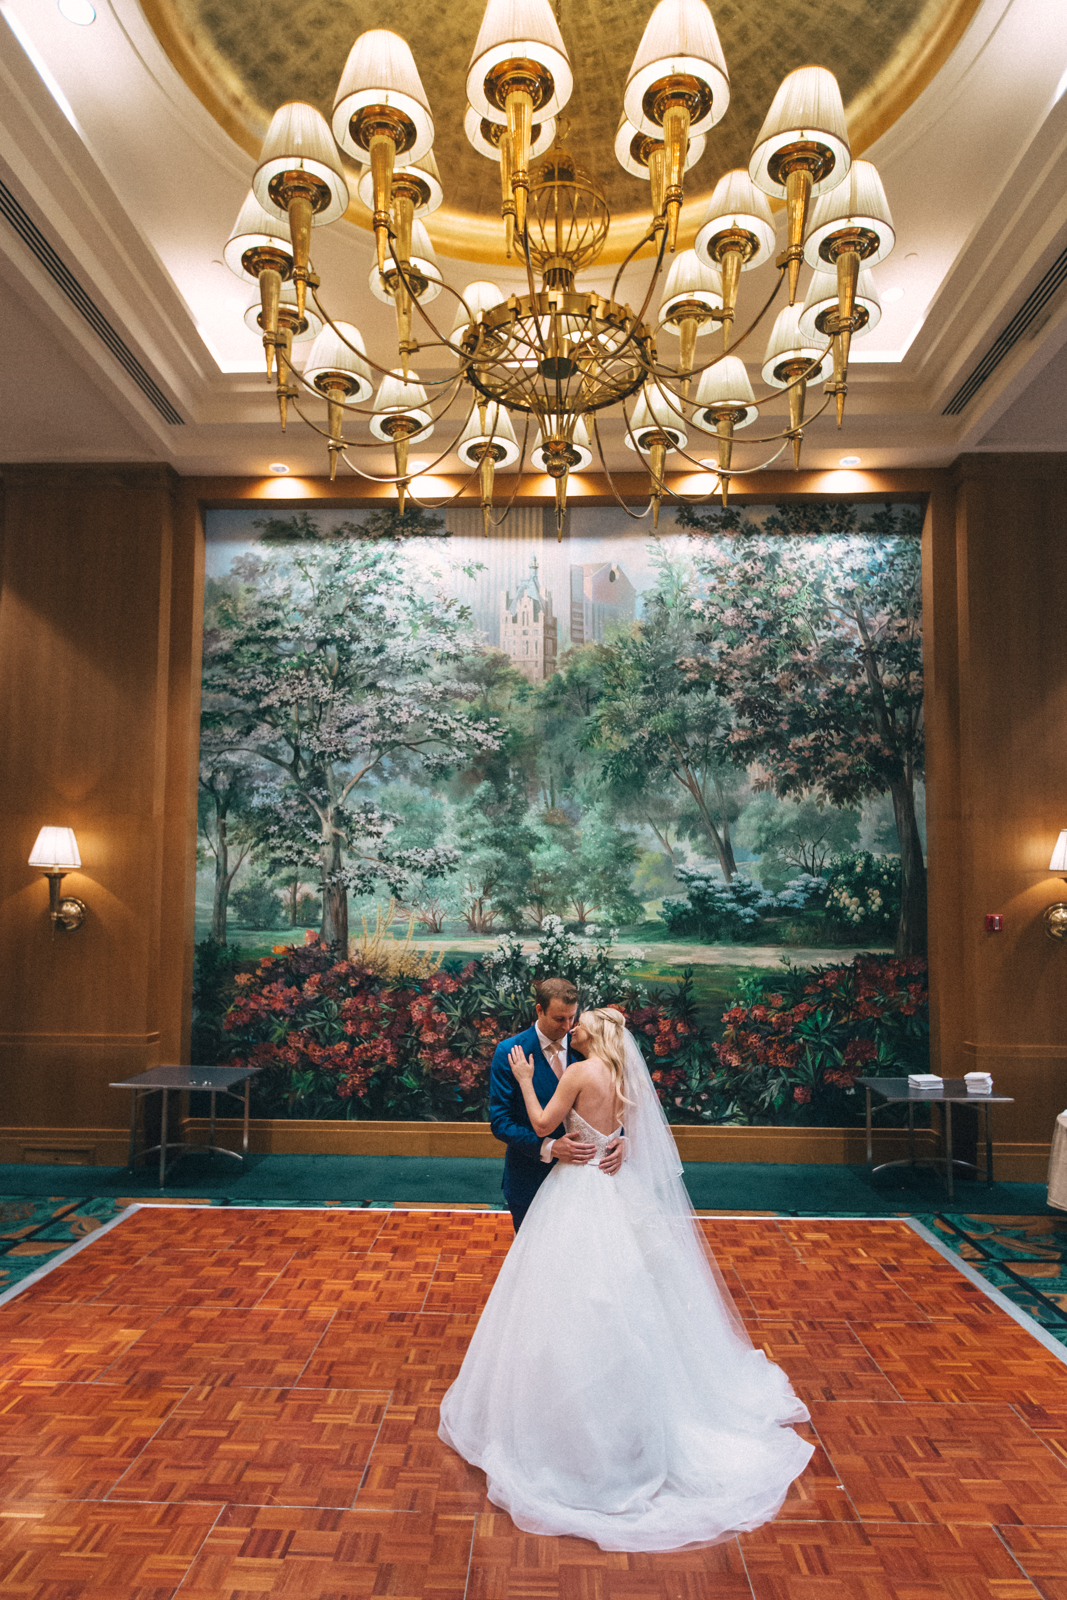 NYC Wedding Photography Sofitel Central Park Brooklyn Photographer Boris Zaretsky _B2C2090.jpg